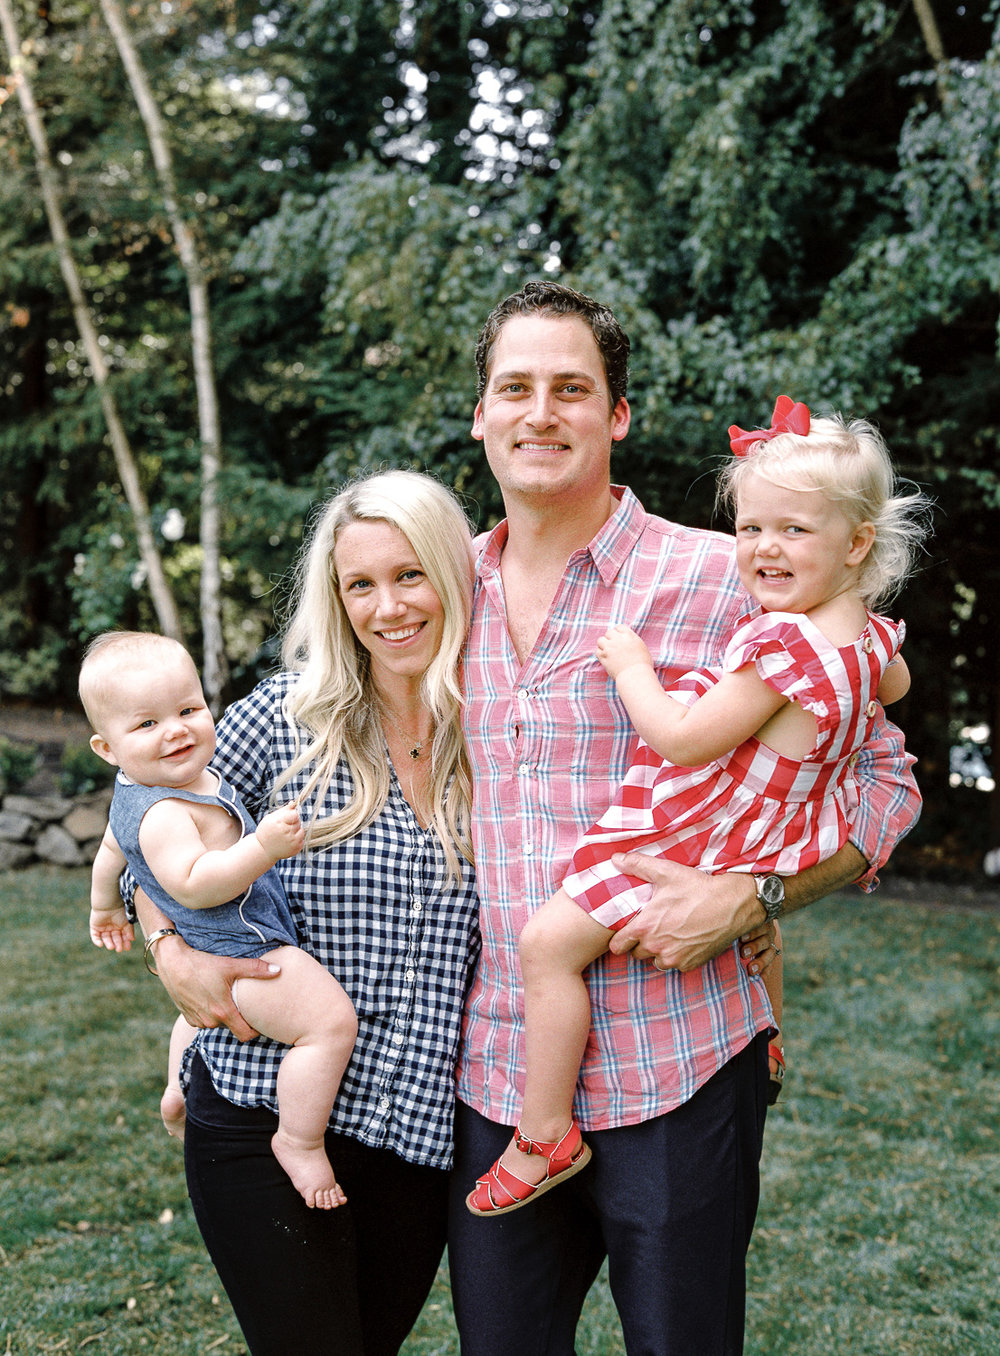 familiesweb0090.jpg